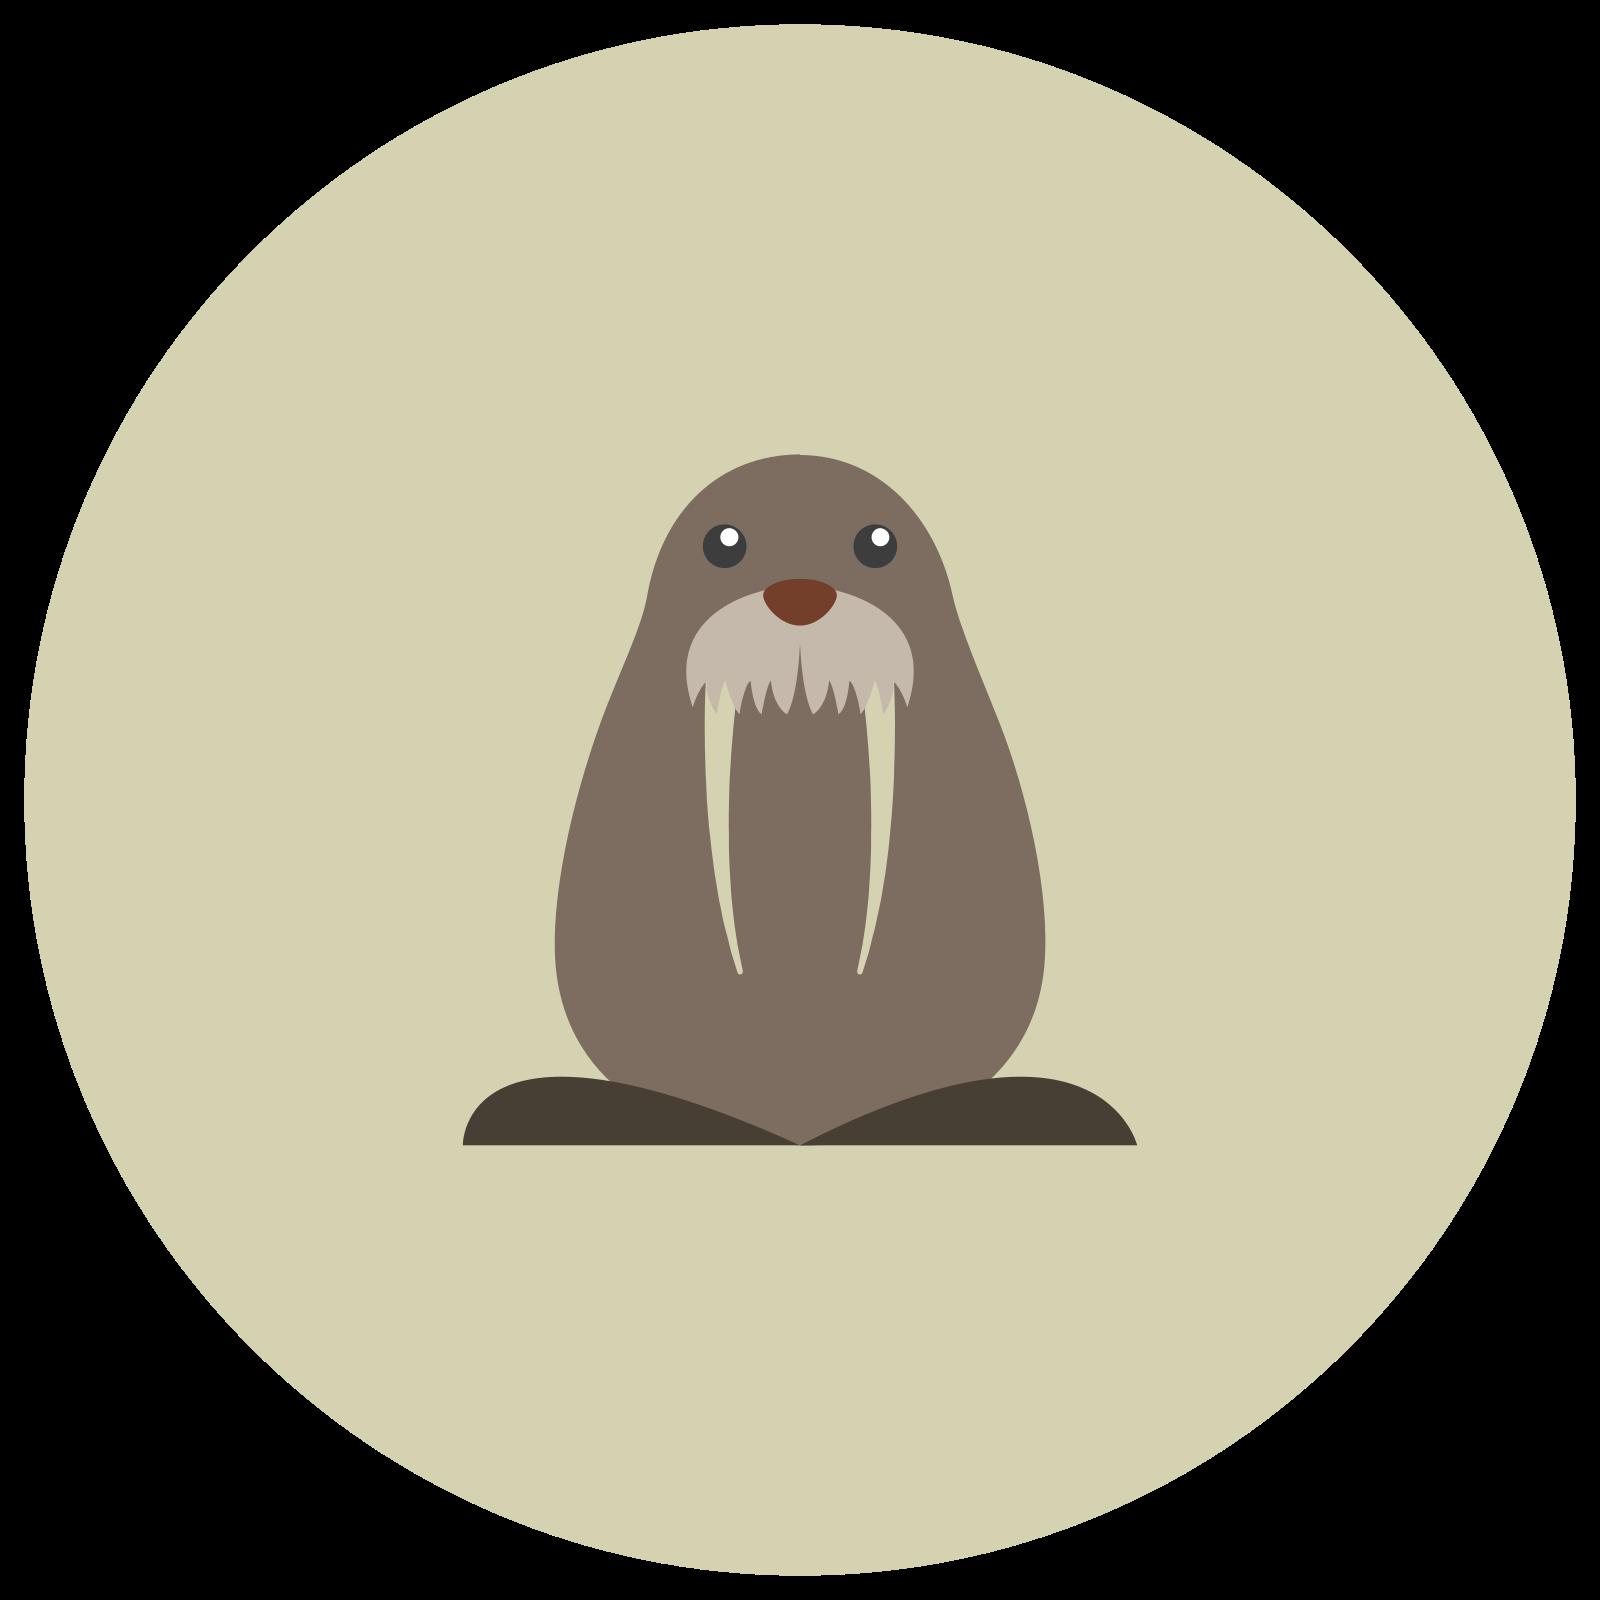 Mors icon